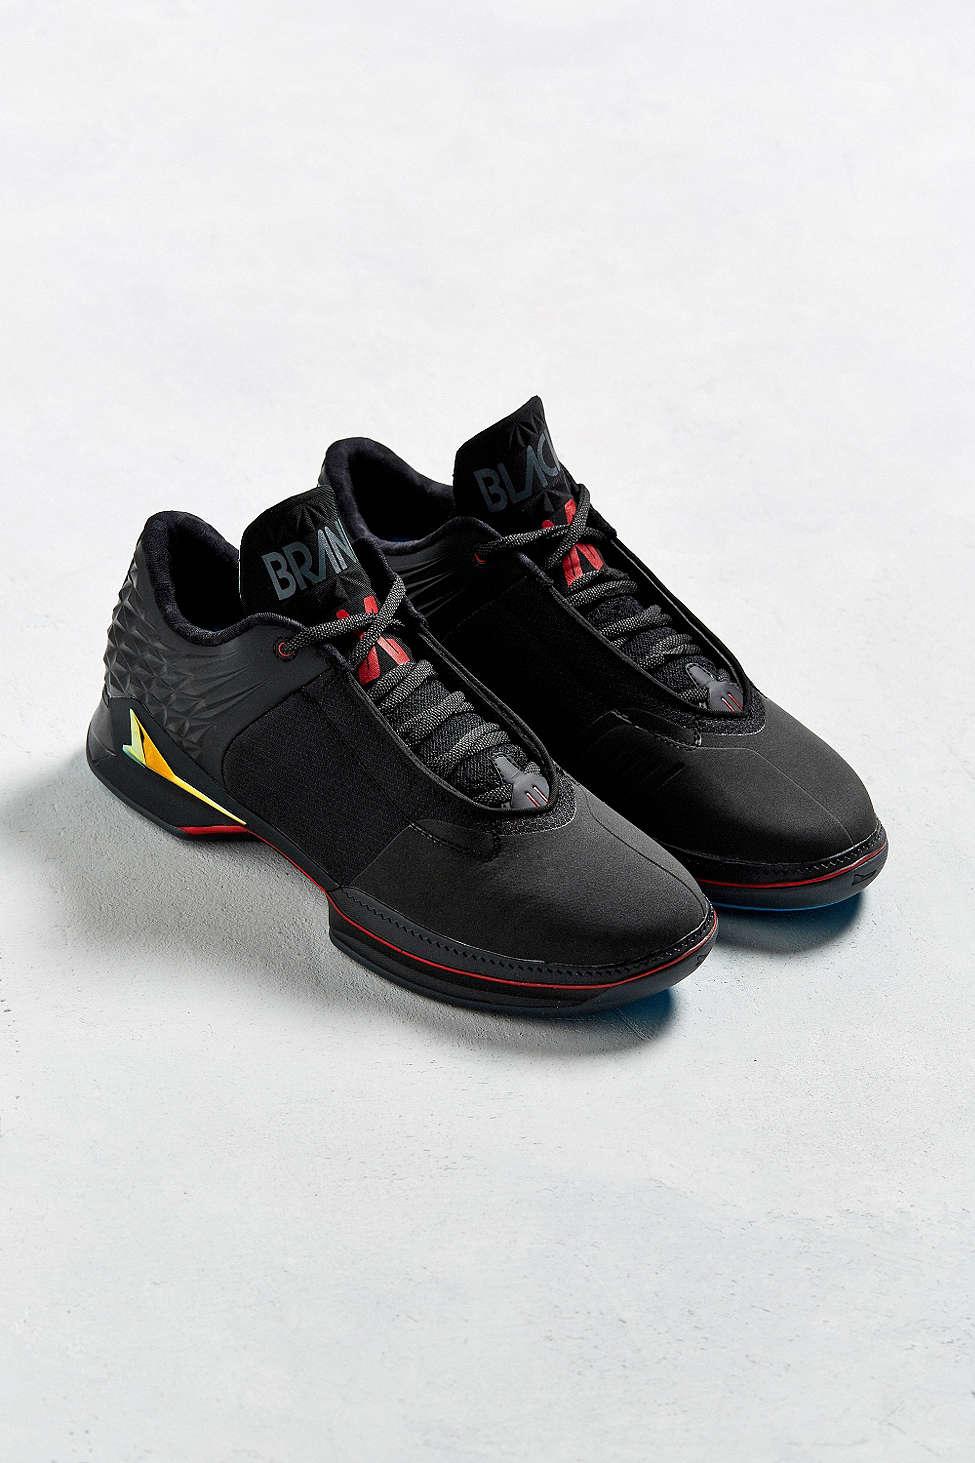 98bd4f5a269 Lyst - Brandblack J. Crossover 2 Low Sneaker in Black for Men